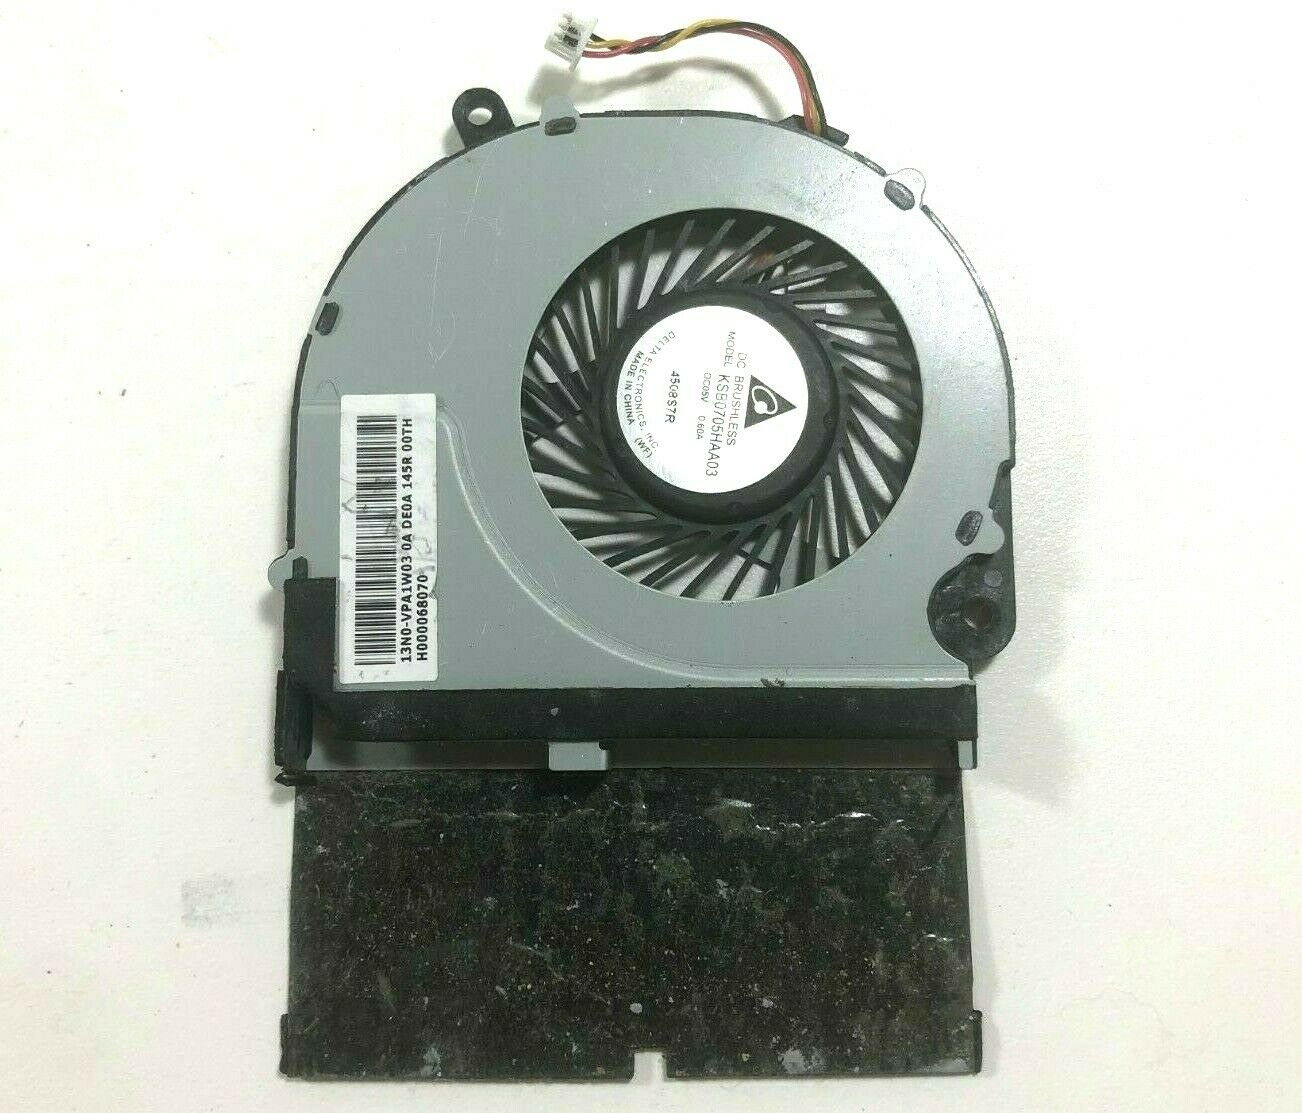 HEATSINK H000068070 GENUINE! TOSHIBA E45T-B4200 E45T-B SERIES CPU COOLING FAN